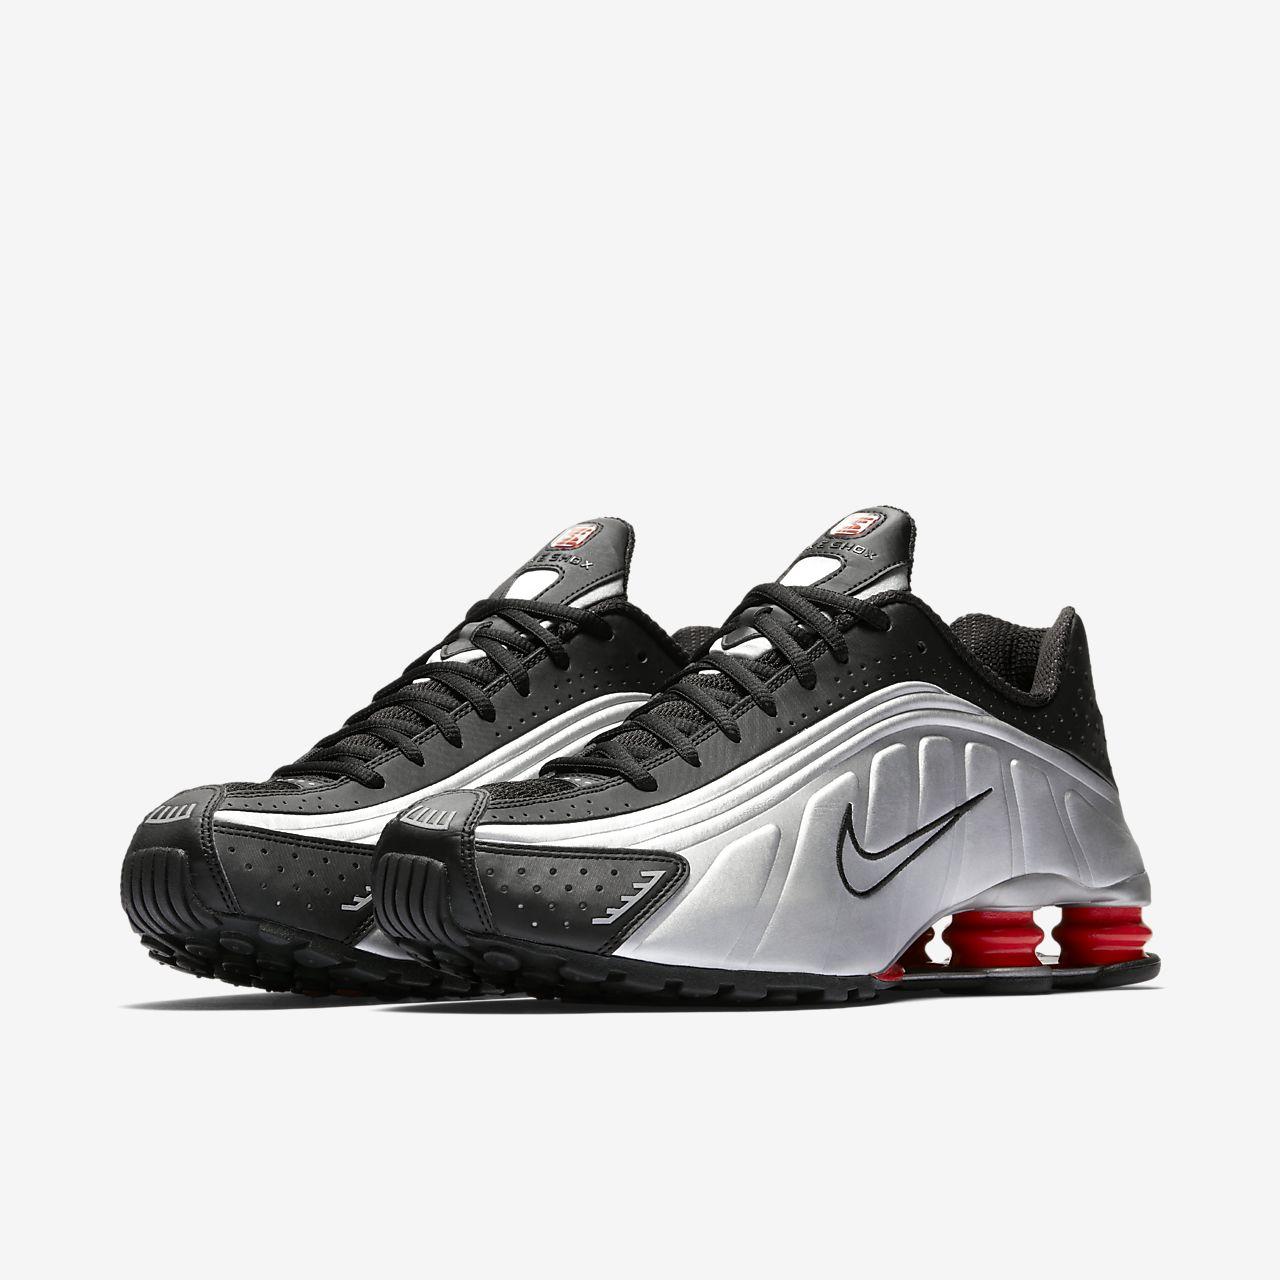 air nike bianche prezzo, Nike Shox R4 Uomo Running Scarpe